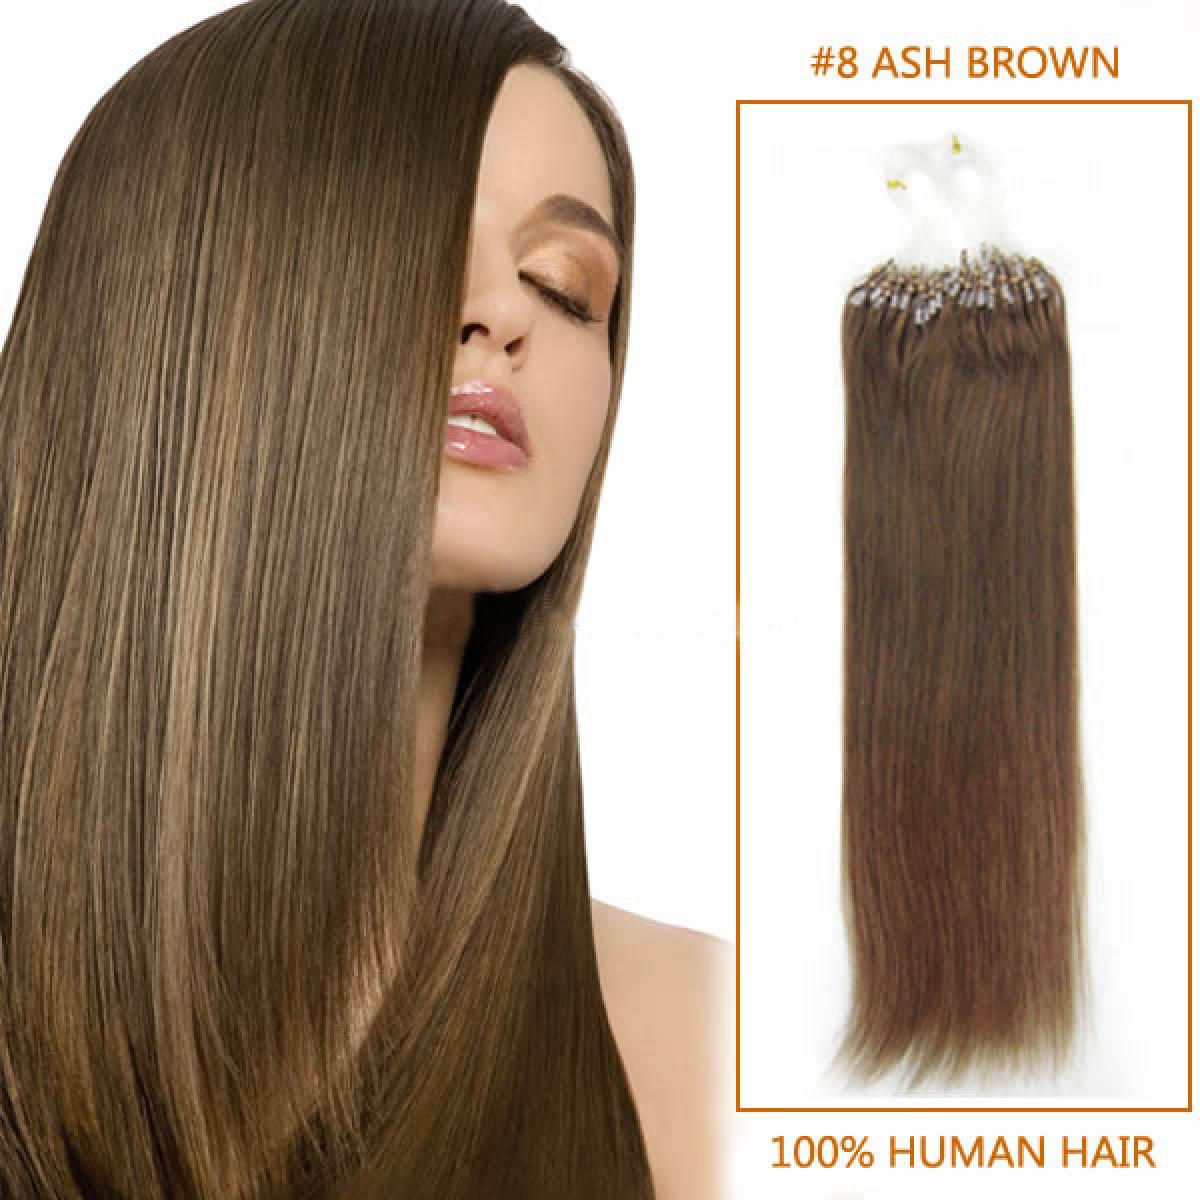 22 Inch 8 Ash Brown Micro Loop Human Hair Extensions 100s